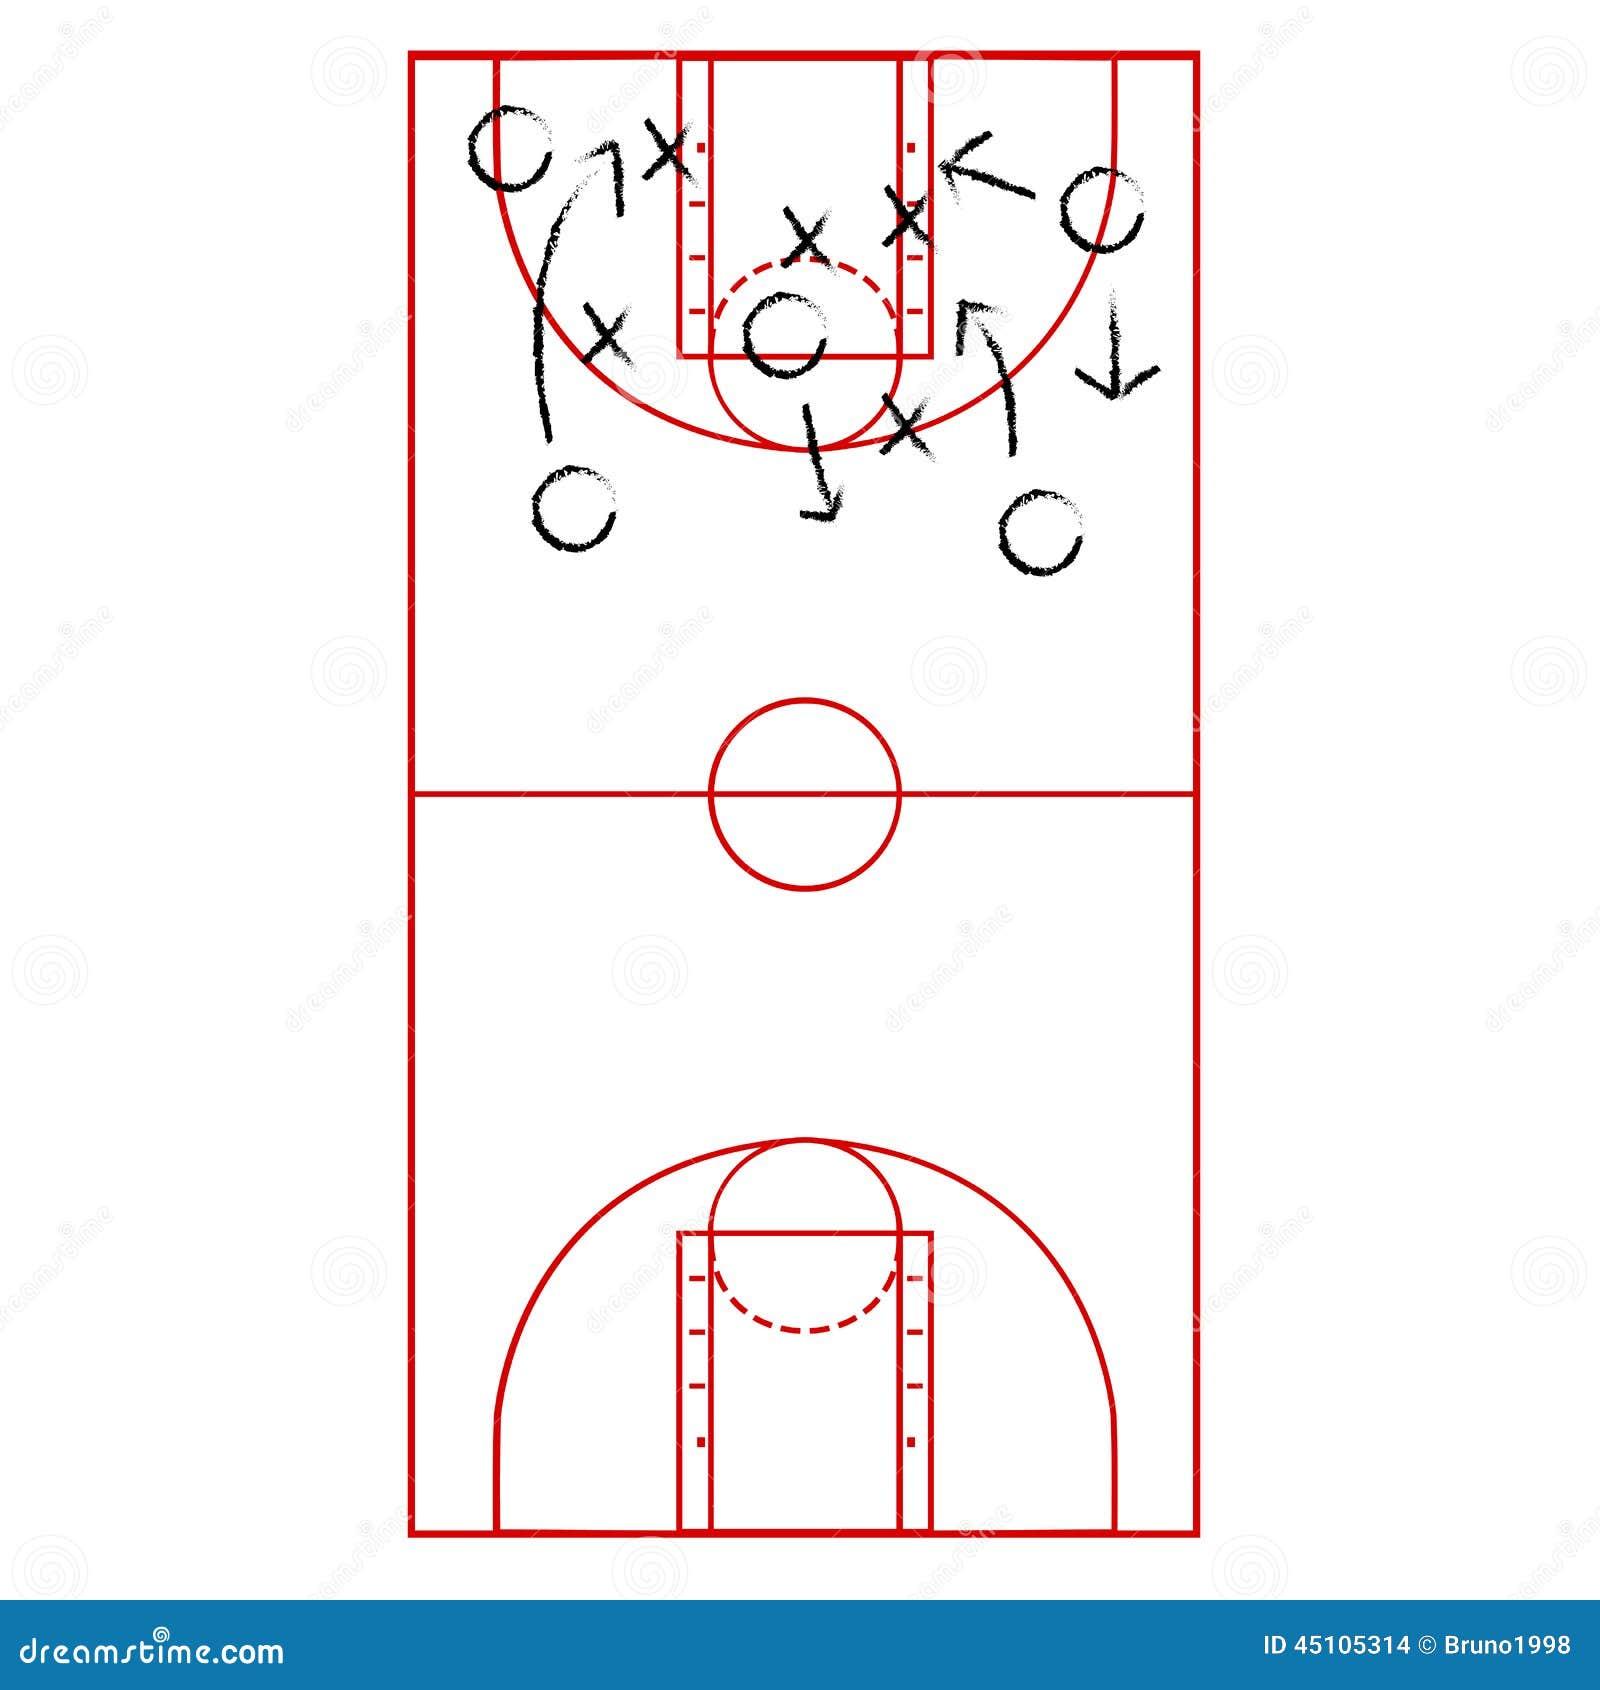 Charmant Basketball Spiel Plan Vorlage Fotos - Entry Level Resume ...